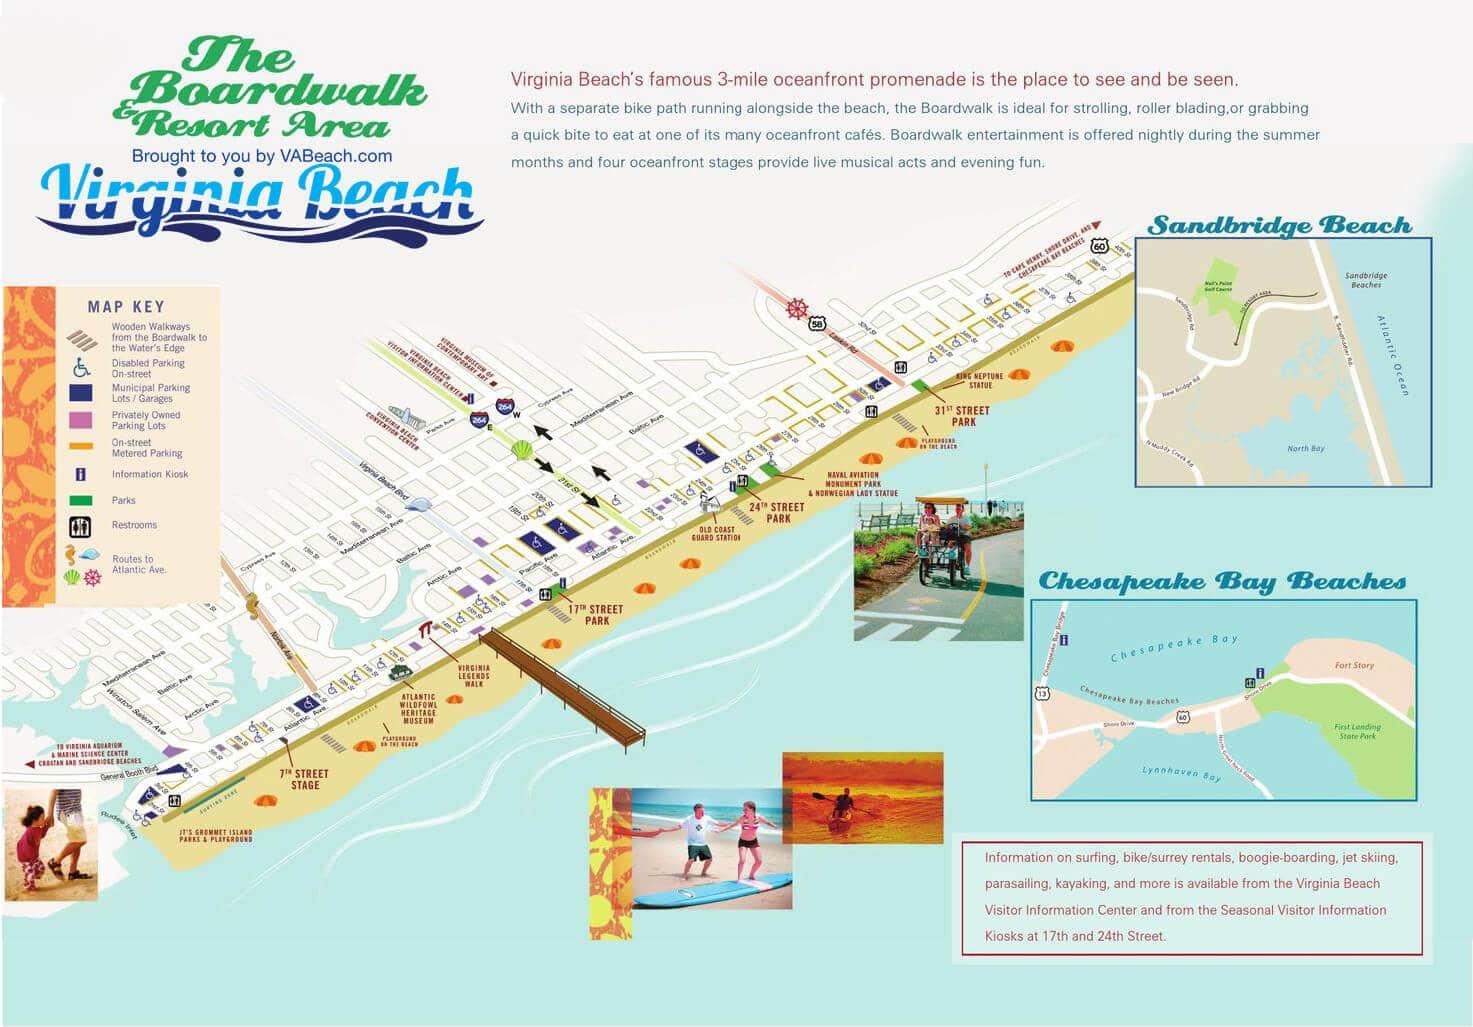 Virginia Beach VA  Find The Best Hotels Restaurants Events